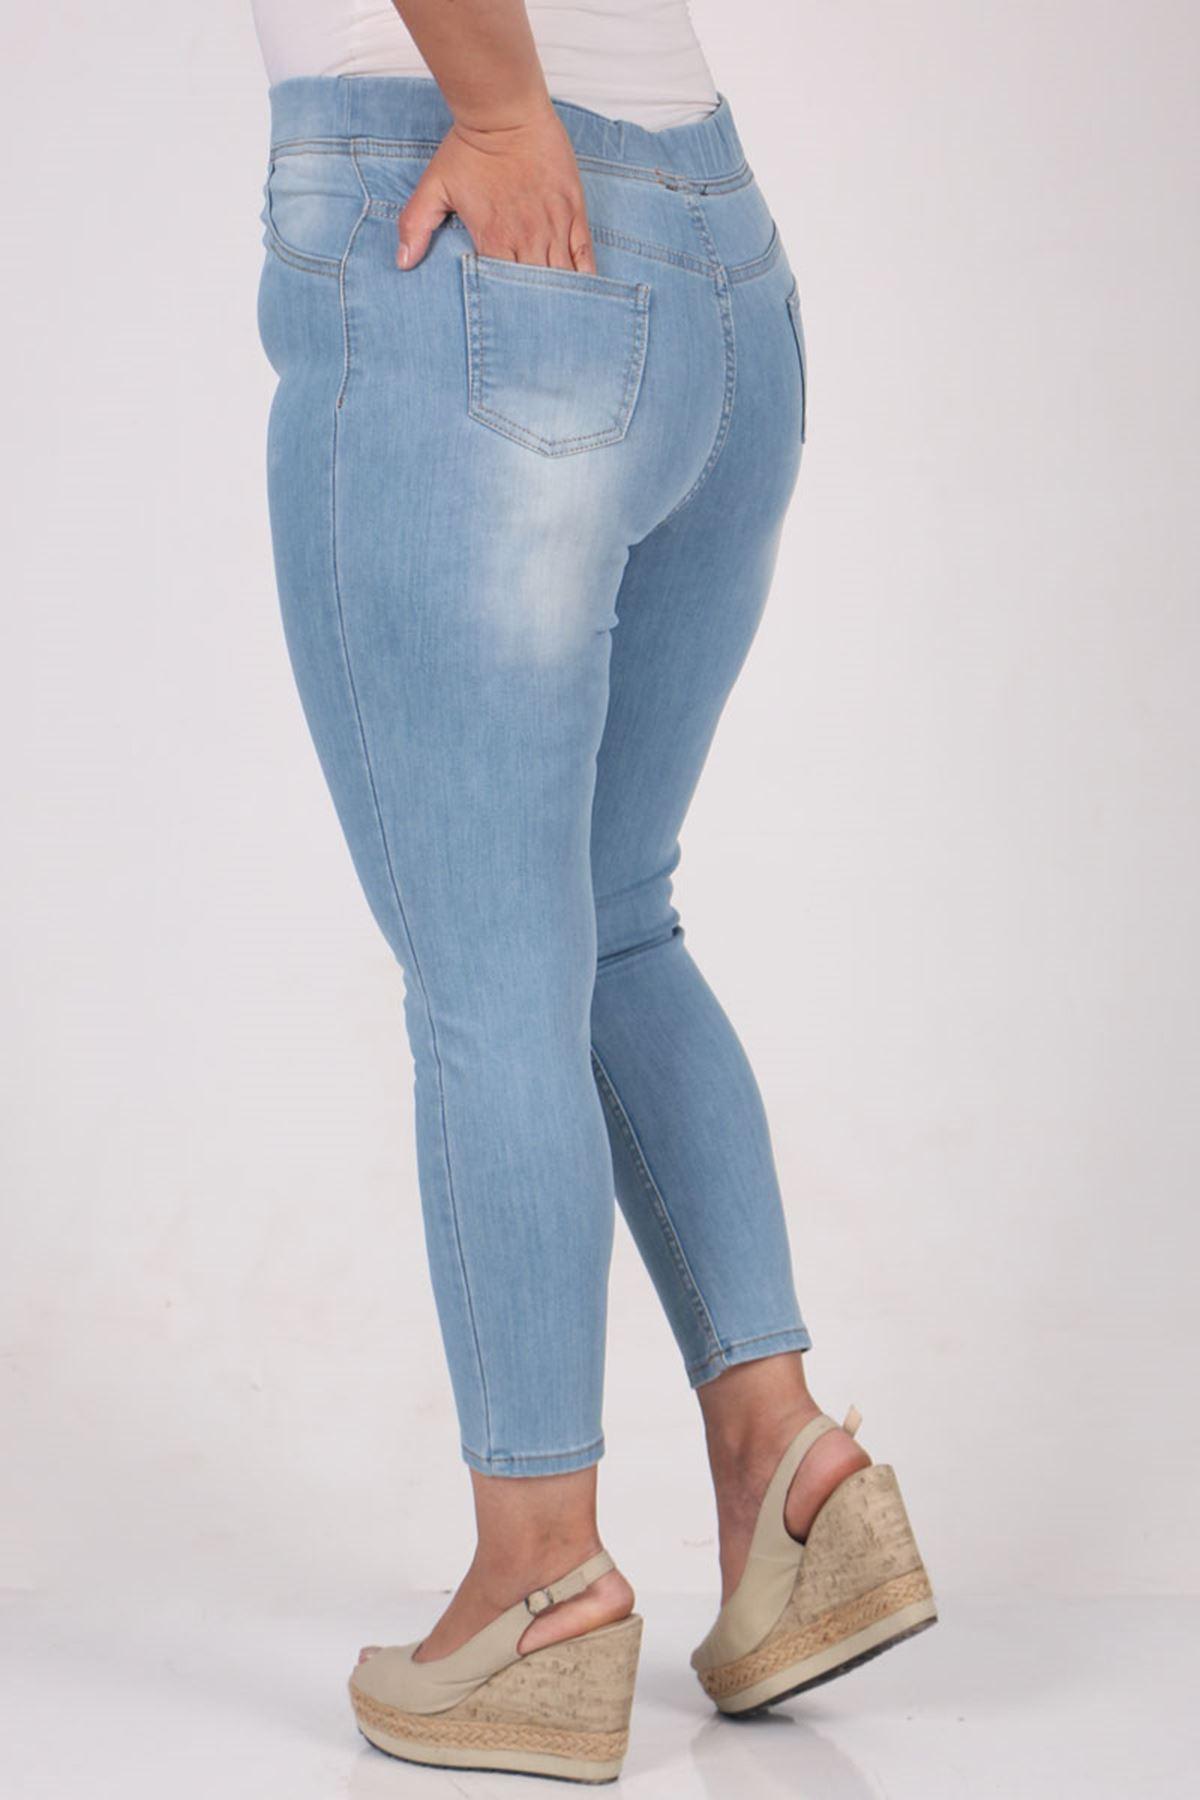 9109-12 Büyük Beden Beli Lastikli Dar Paça Kot Pantalon- Buz Mavi